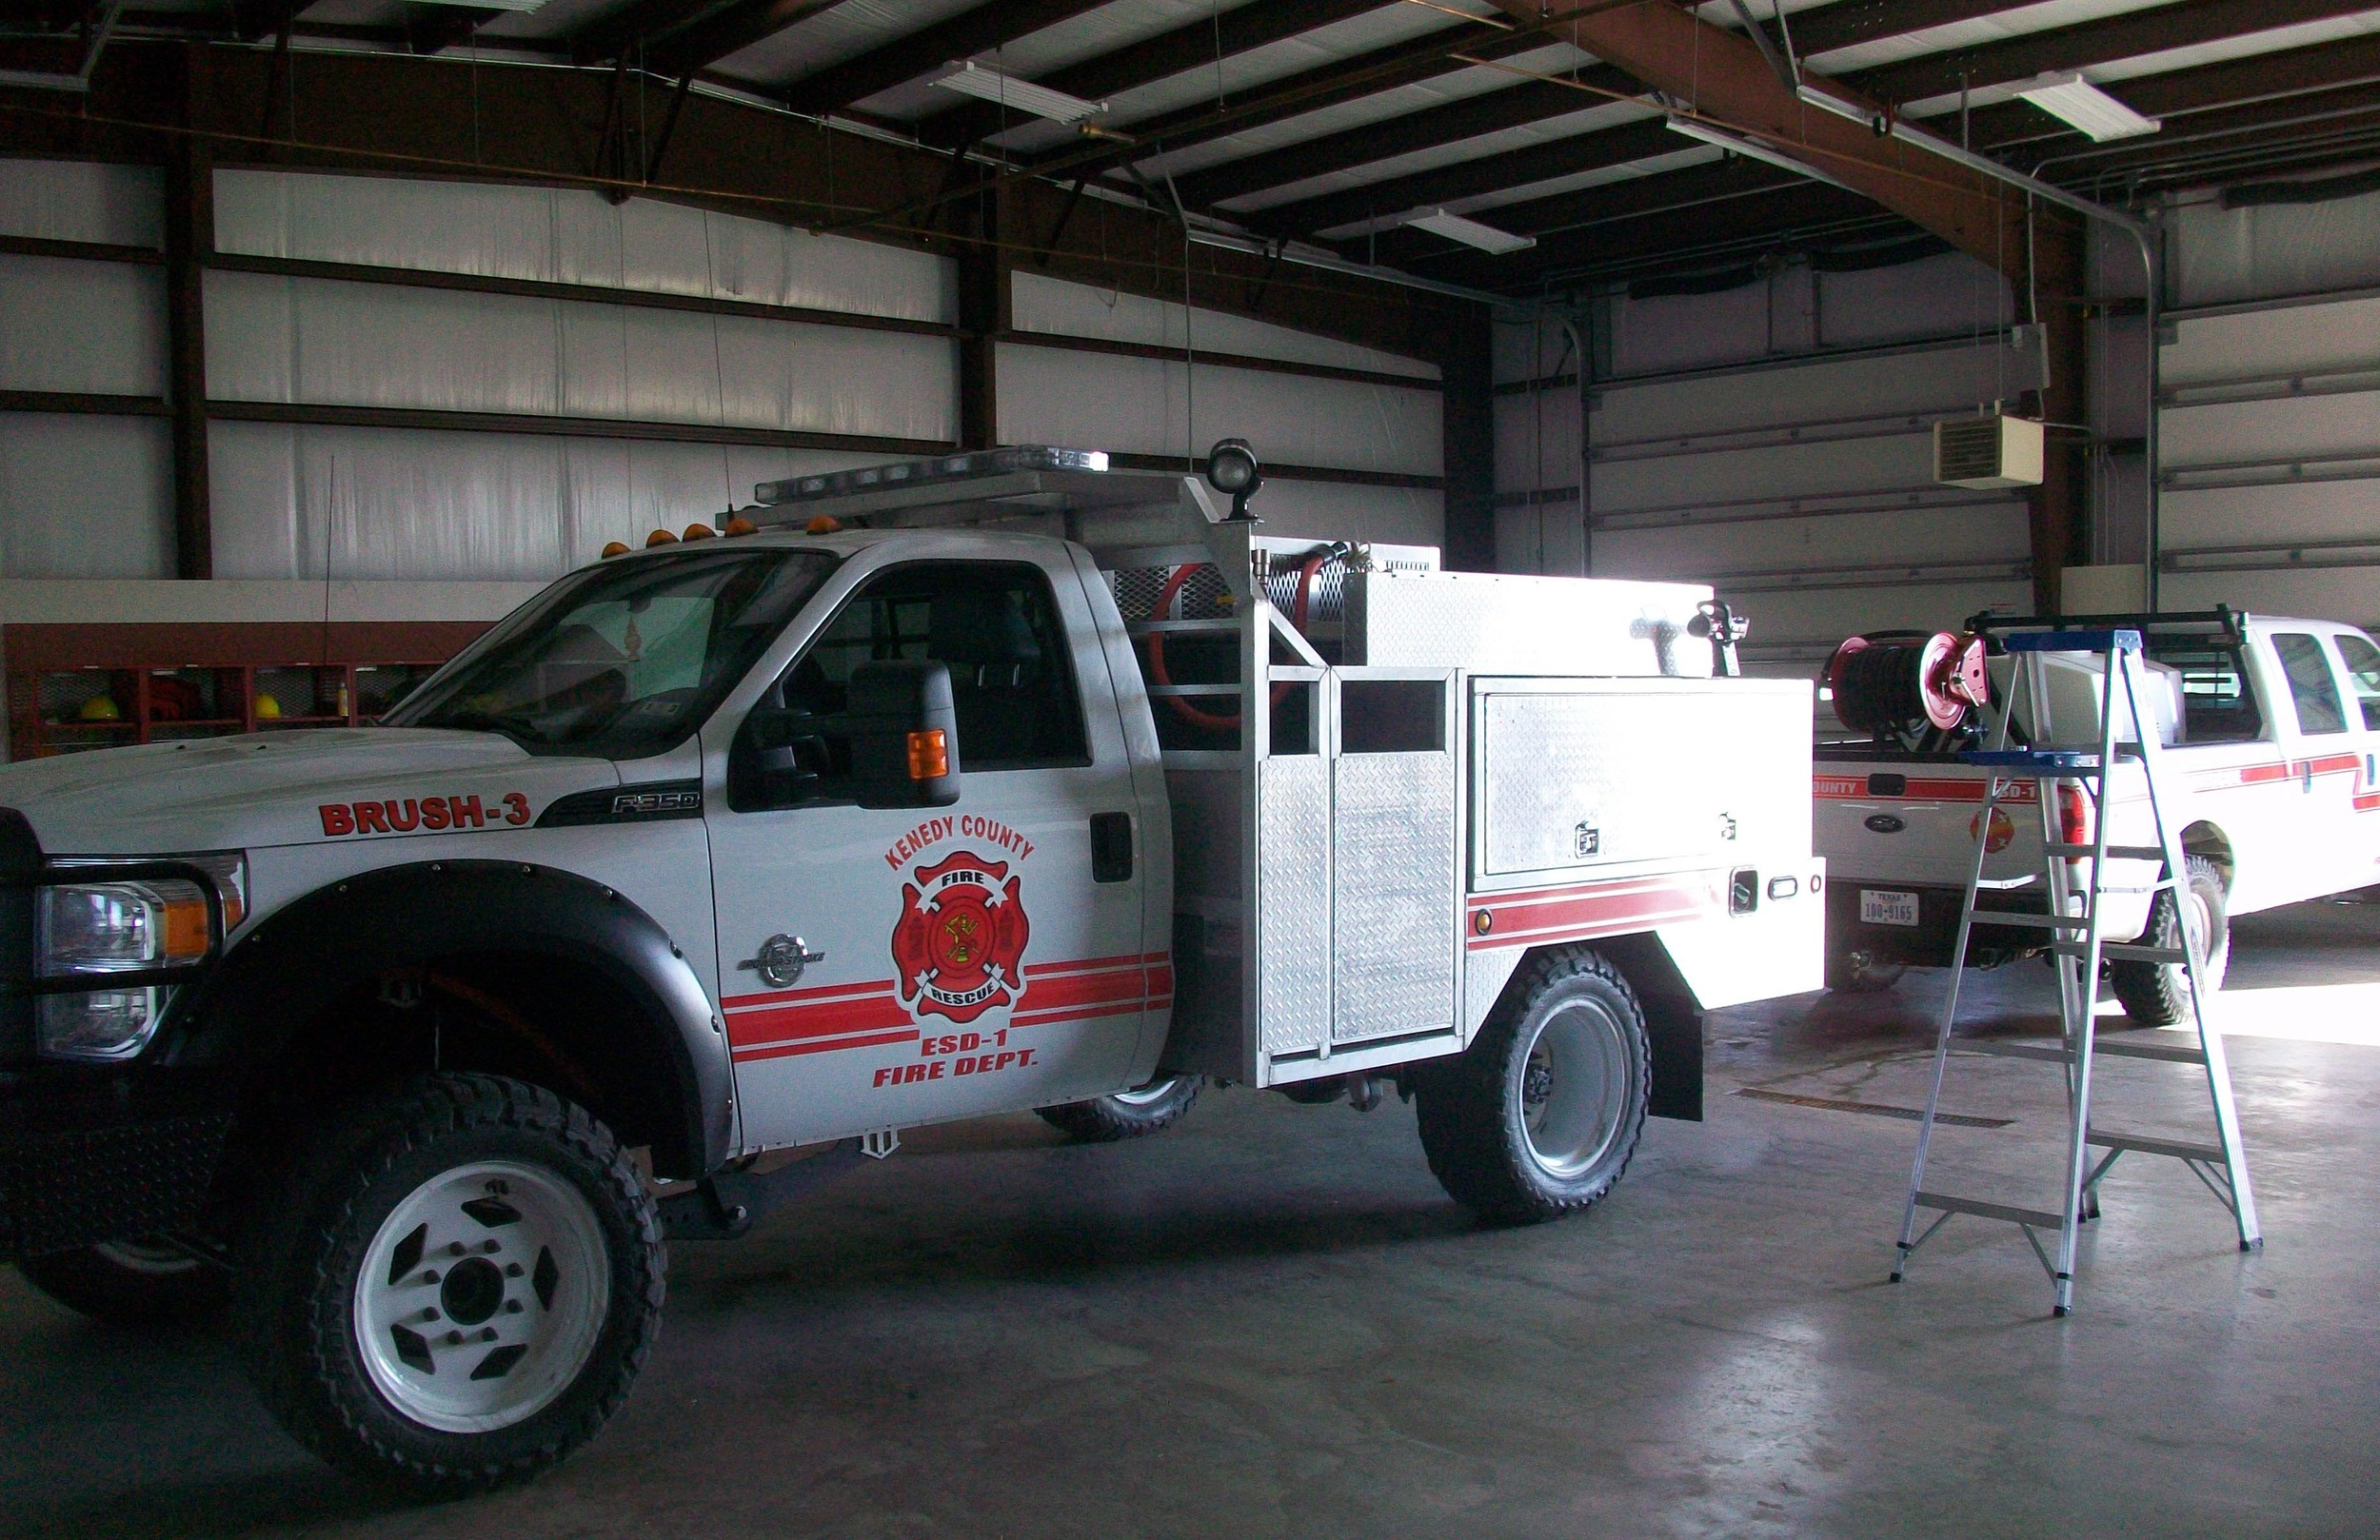 kenedy county fire station